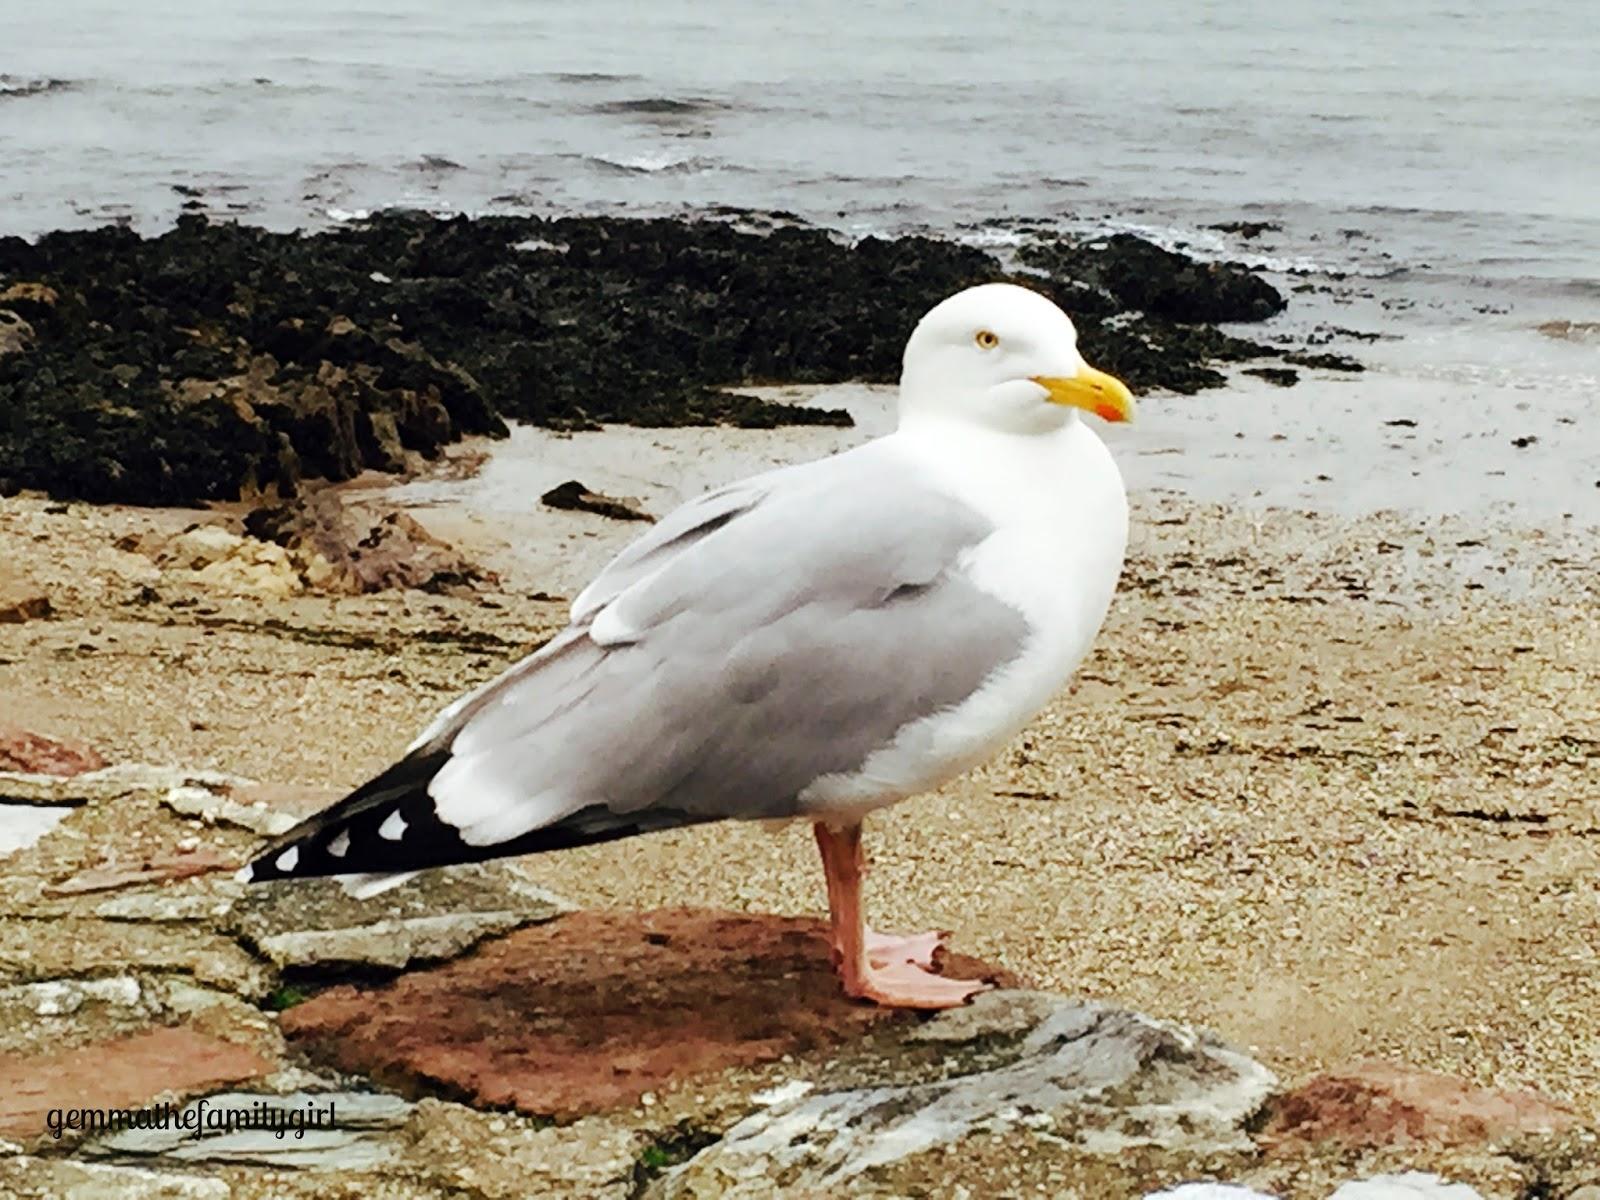 seagull, gull, sea bird, bird, cornwall, cawsand, sunday photo, photo, birds, blogger, blog, parent blog, plymouth bloggers, plymouth blog, single, lifestyle,